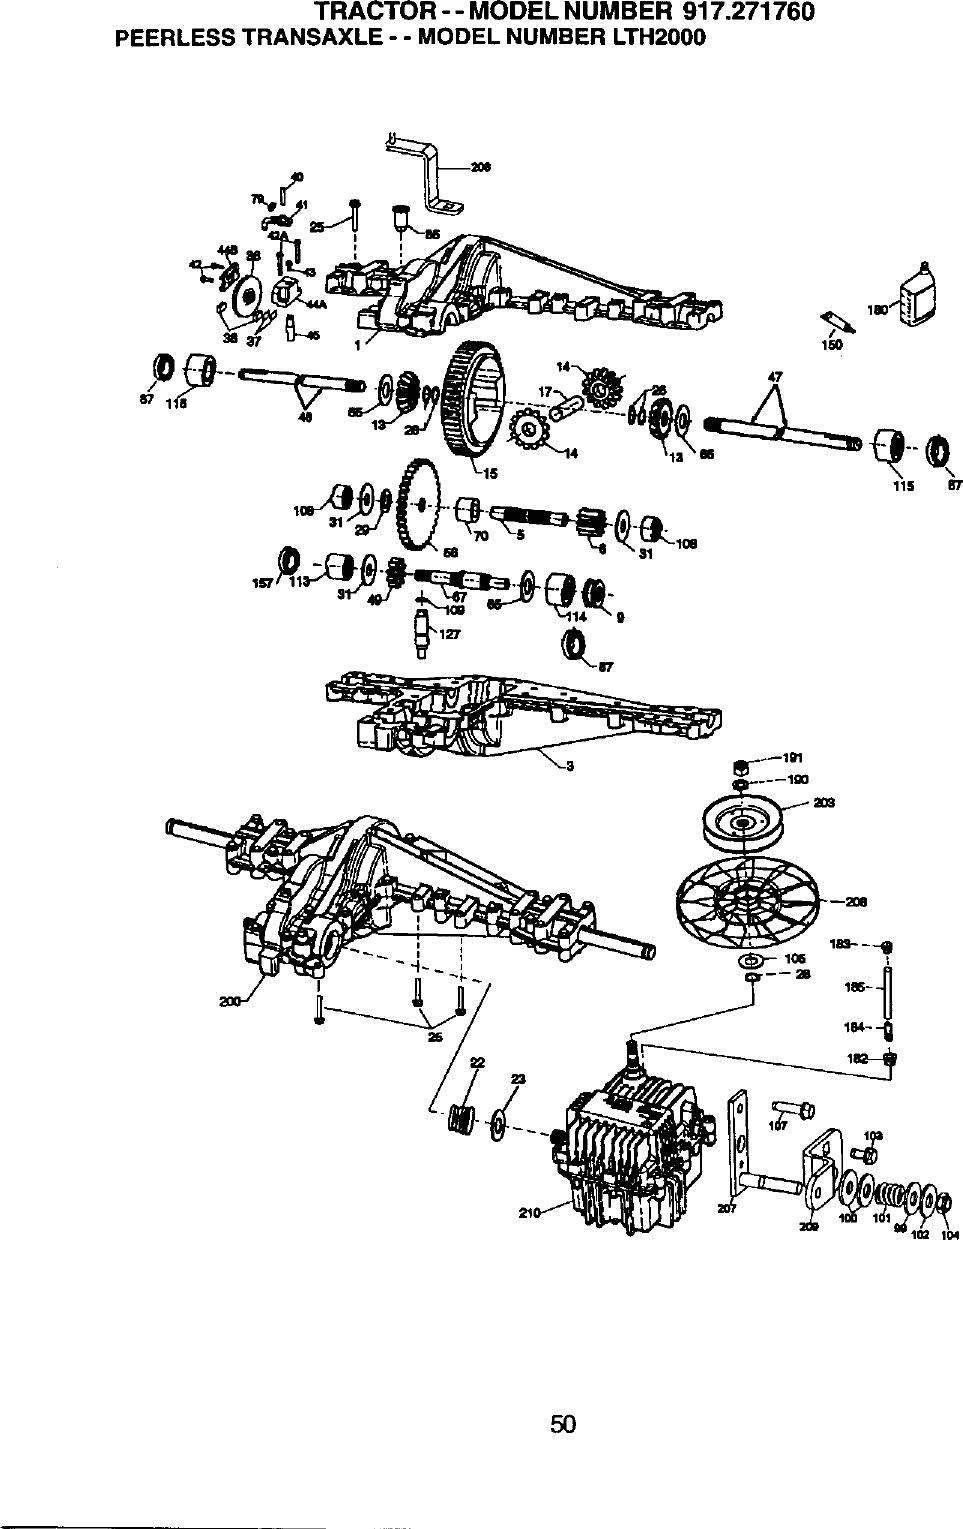 Peerless Transmission Parts Diagram | Wiring Diagram